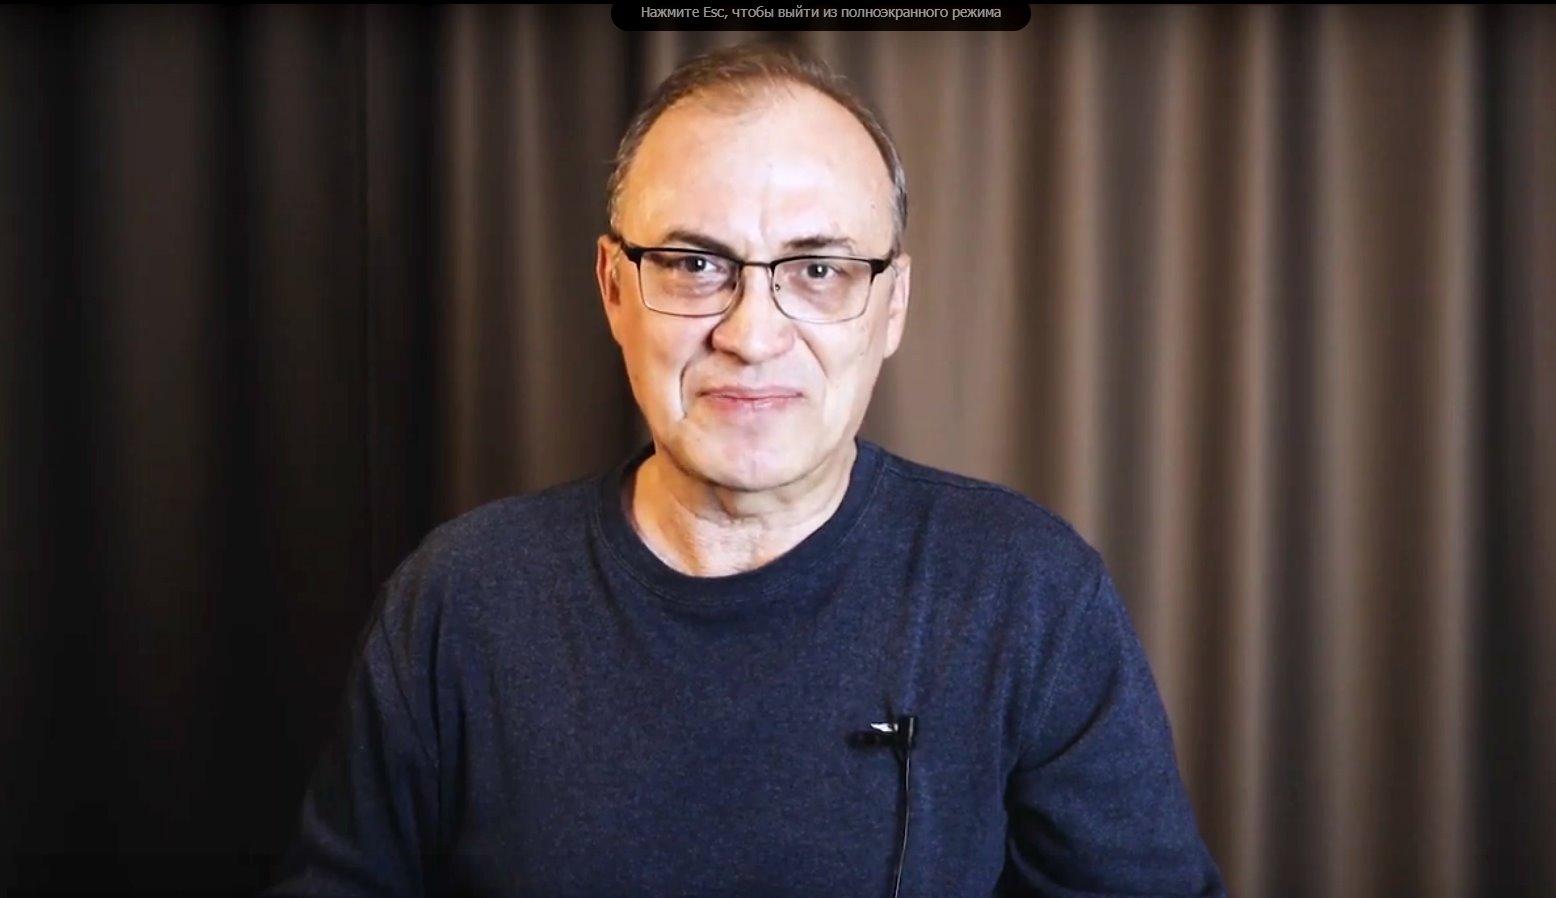 Ютьюб-канал Виталия Кальпиди